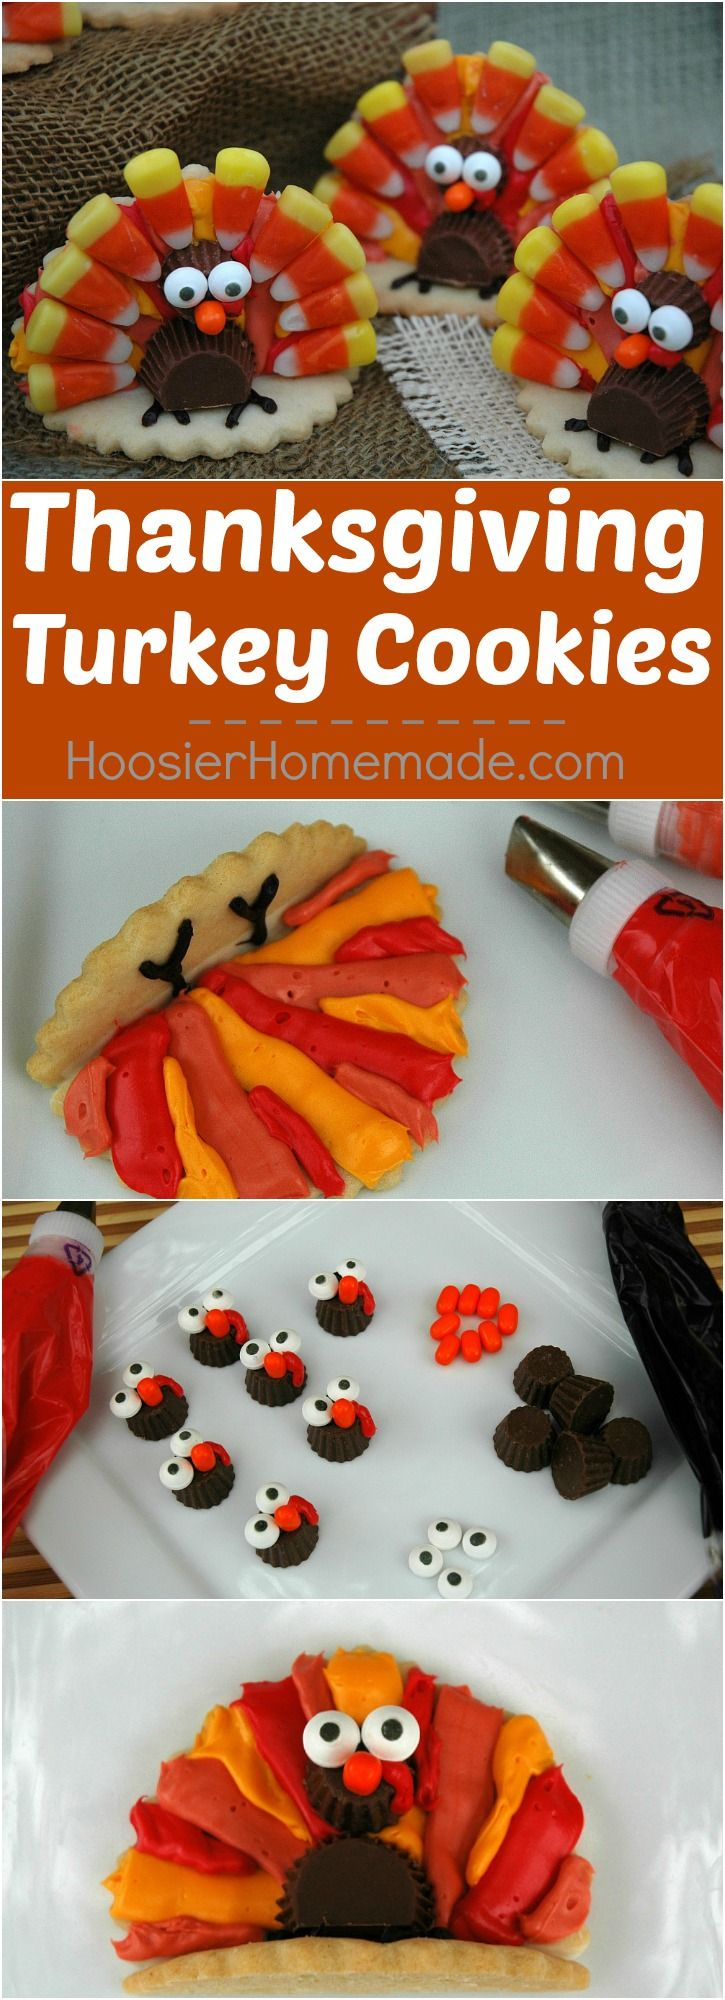 Almond Sugar Cookies Recipe Thanksgiving Turkey